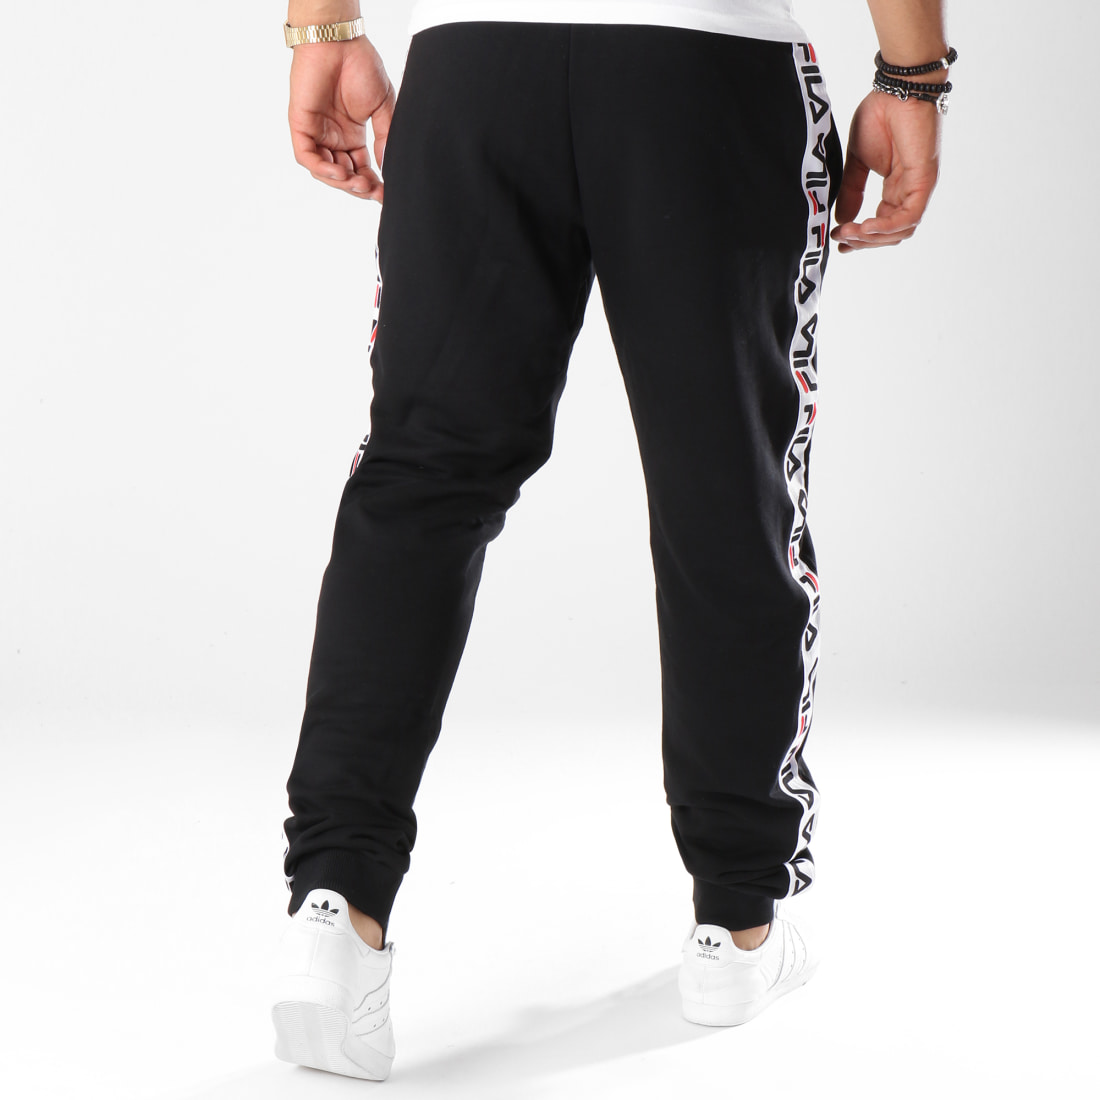 Fila Pantalon Jogging Bande Brodée Tadeo 682365 Noir Blanc